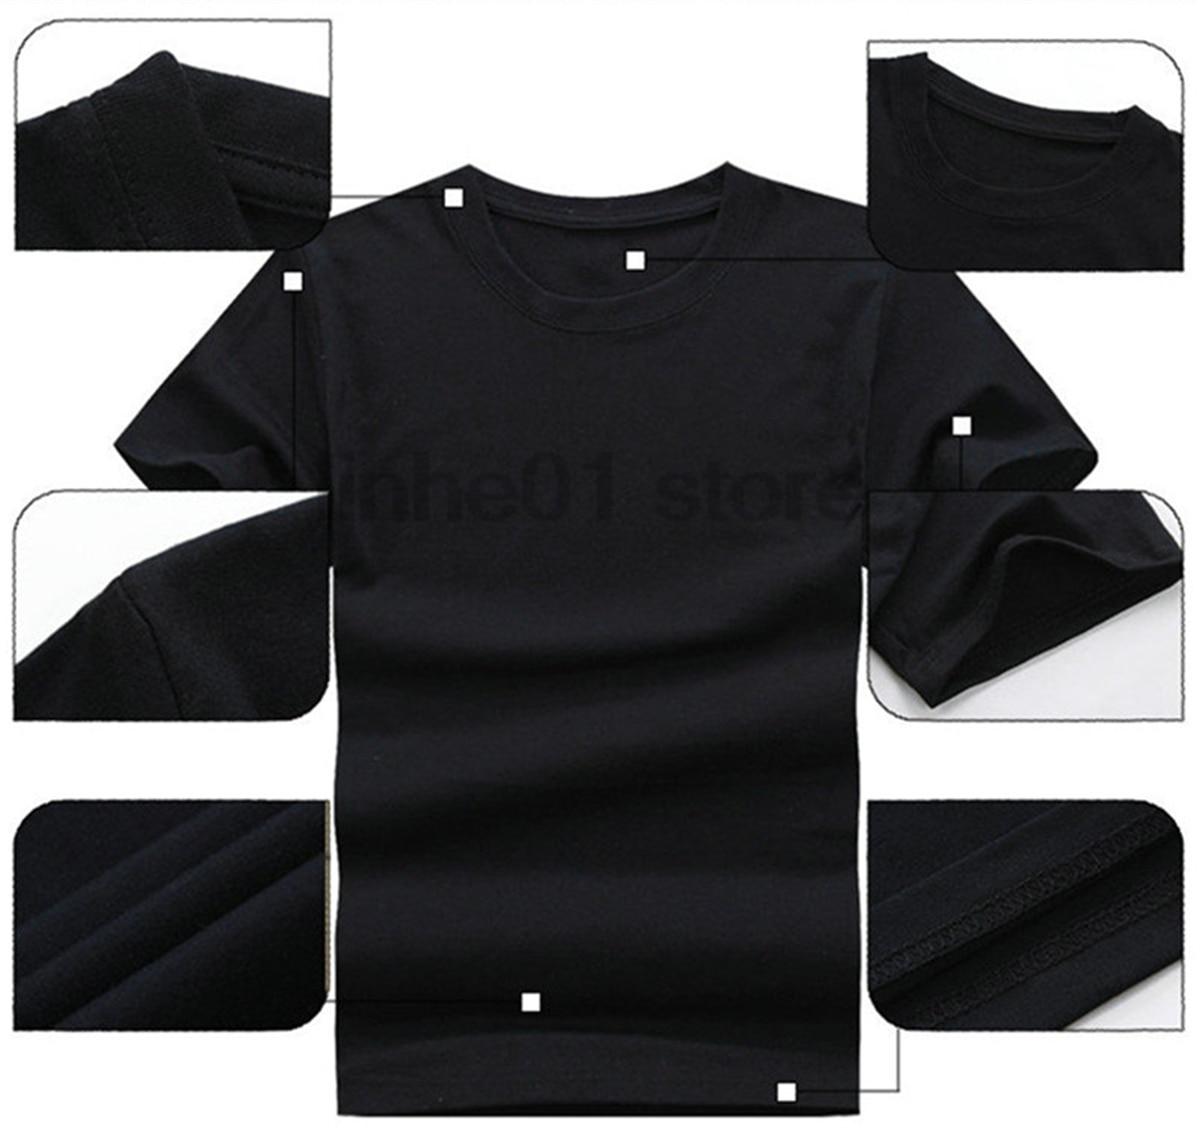 GILDAN Pharmacy Technician Shirts - Pharmacy Technician Tshirt Dress female T-shirt